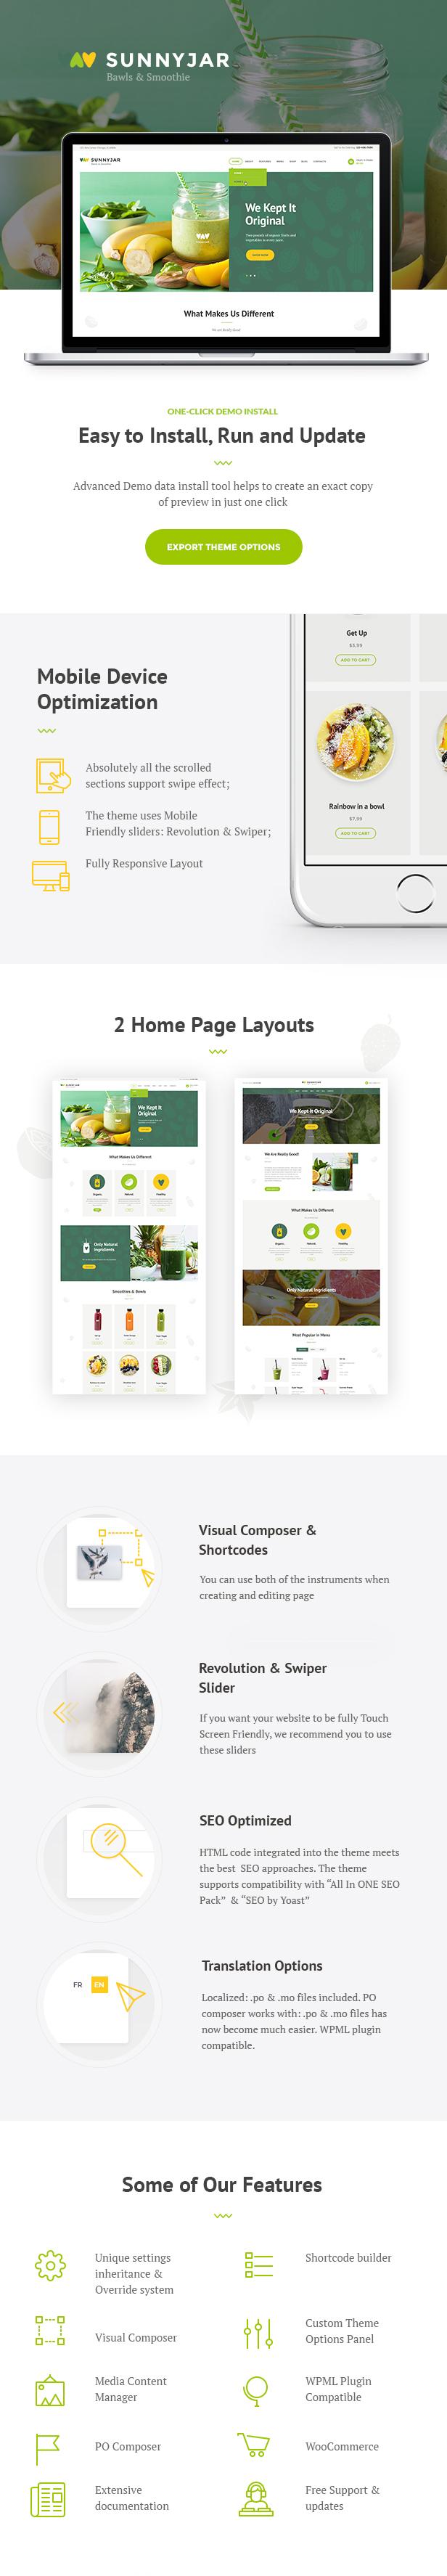 SunnyJar - Smoothie Bar & Gesunde Getränke Shop WordPress Template